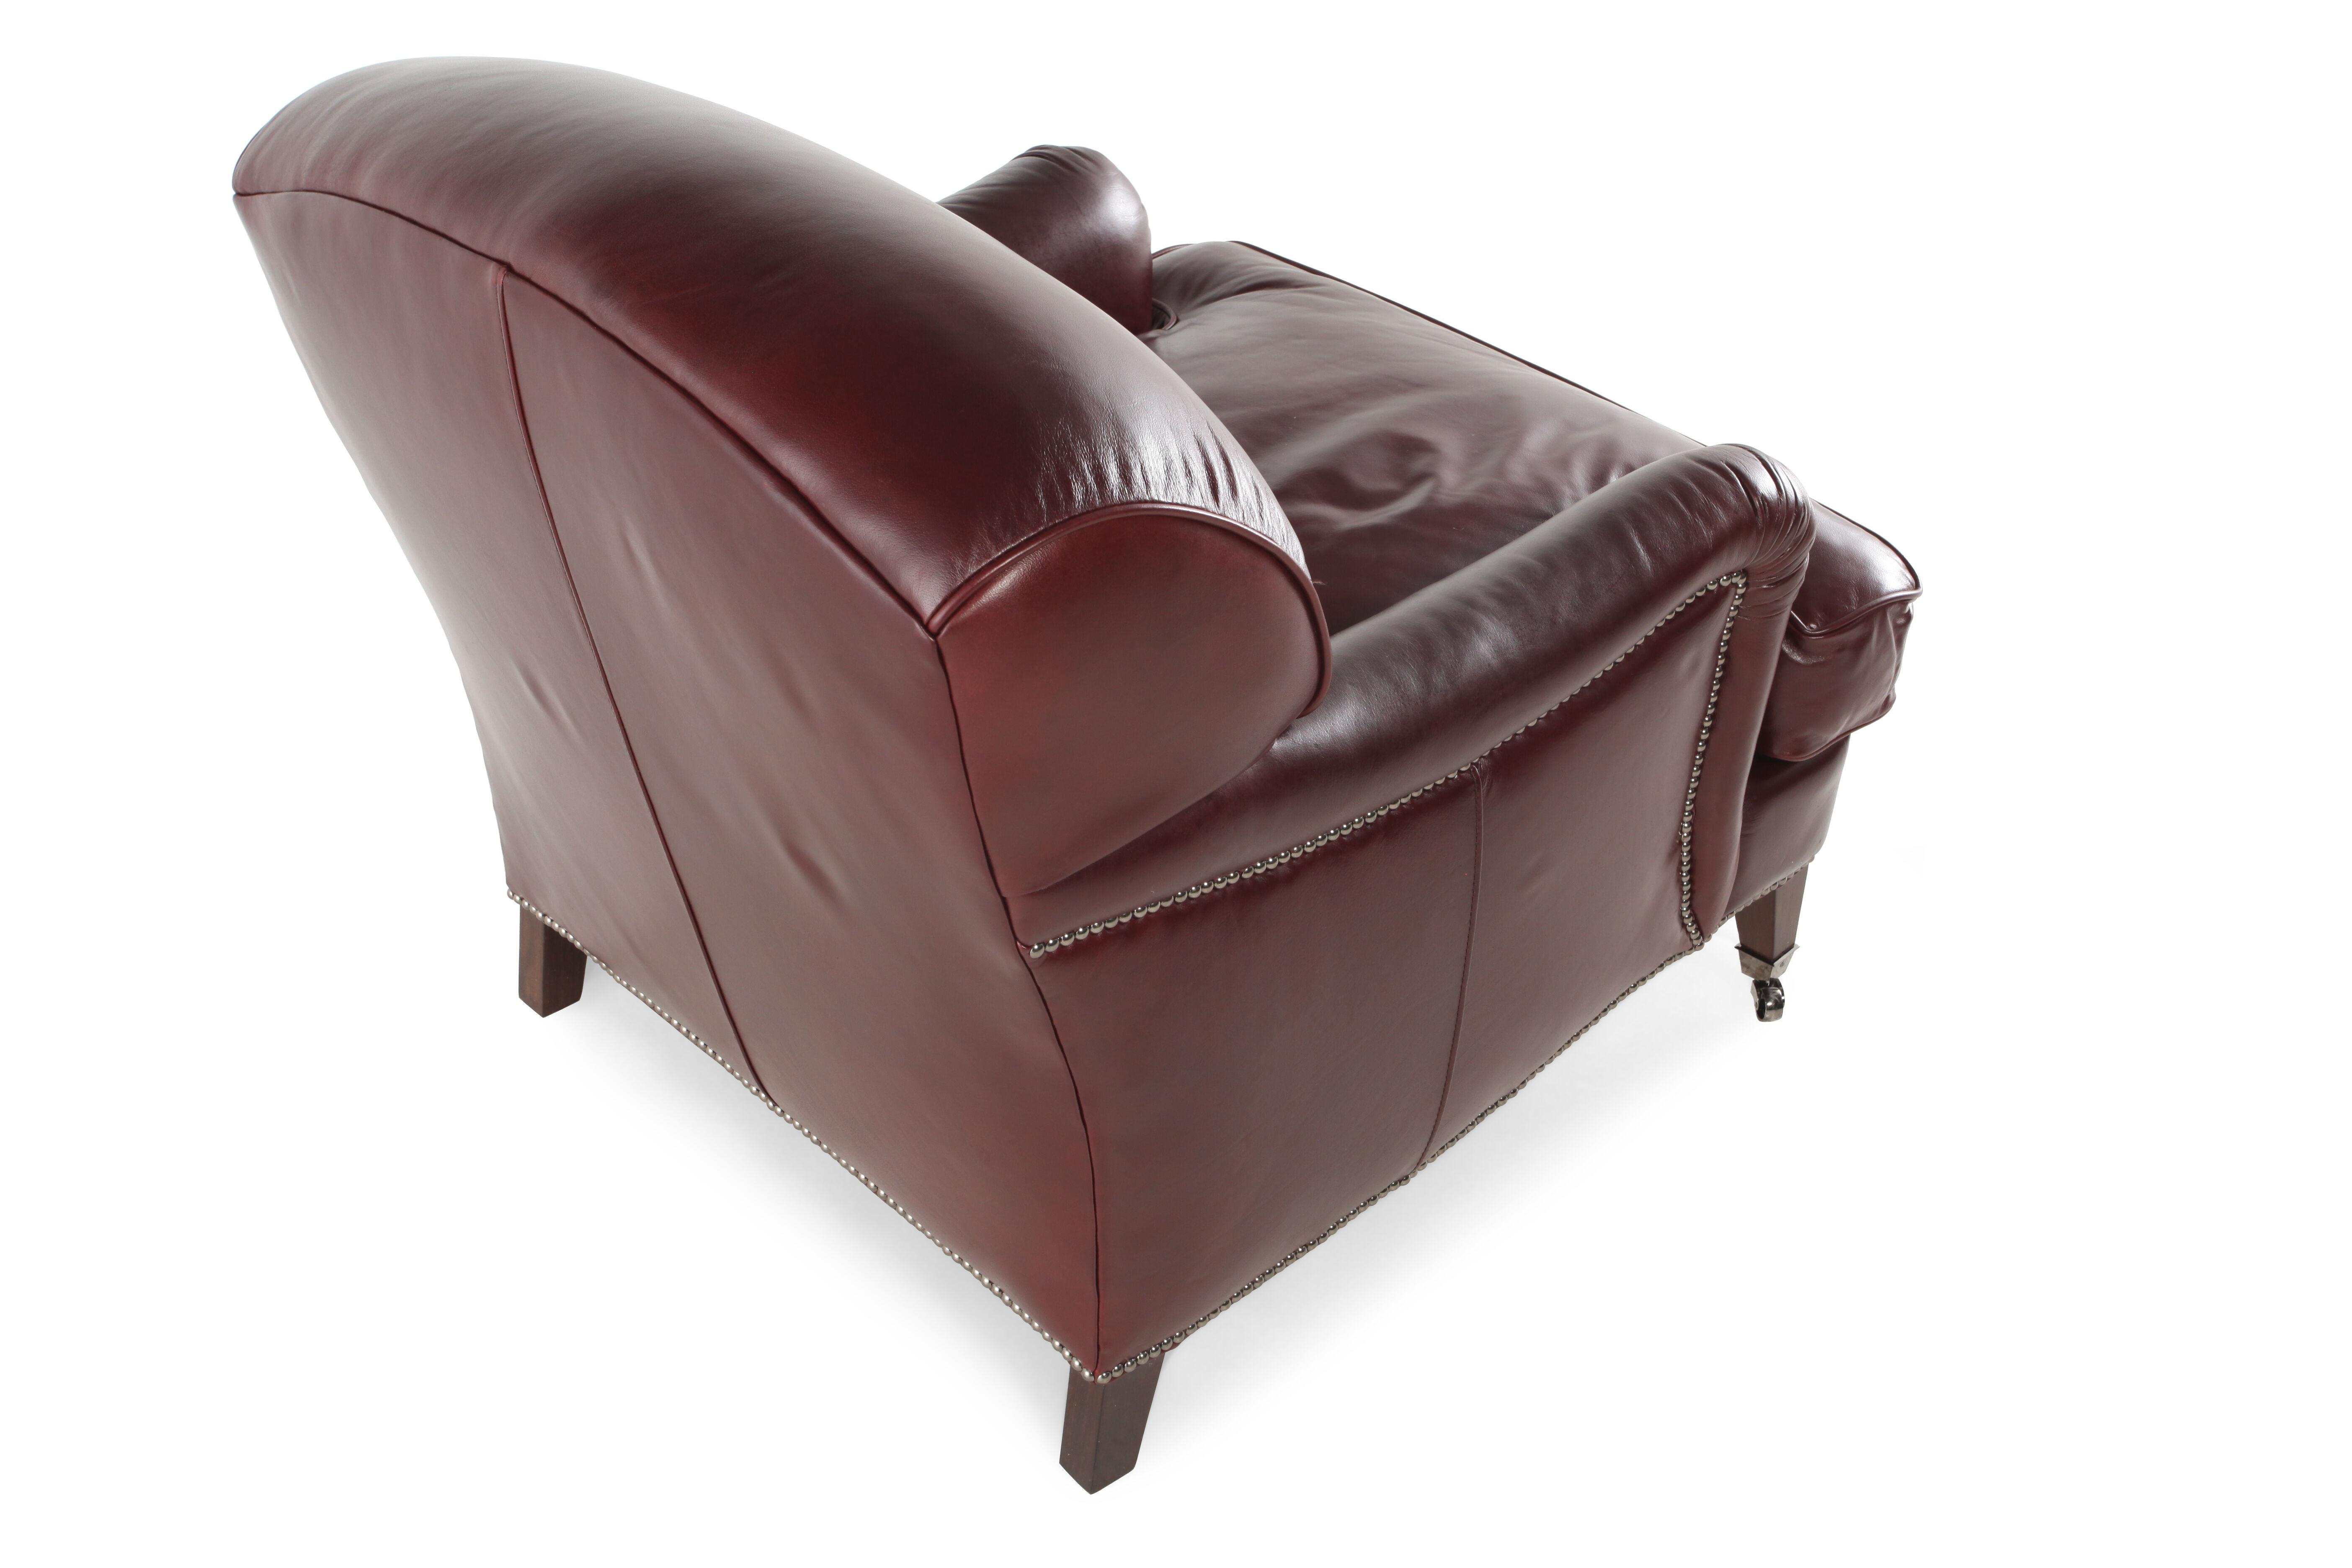 Henredon Angelica Leather Chair  sc 1 st  Mathis Brothers & Henredon Angelica Leather Chair | Mathis Brothers Furniture islam-shia.org